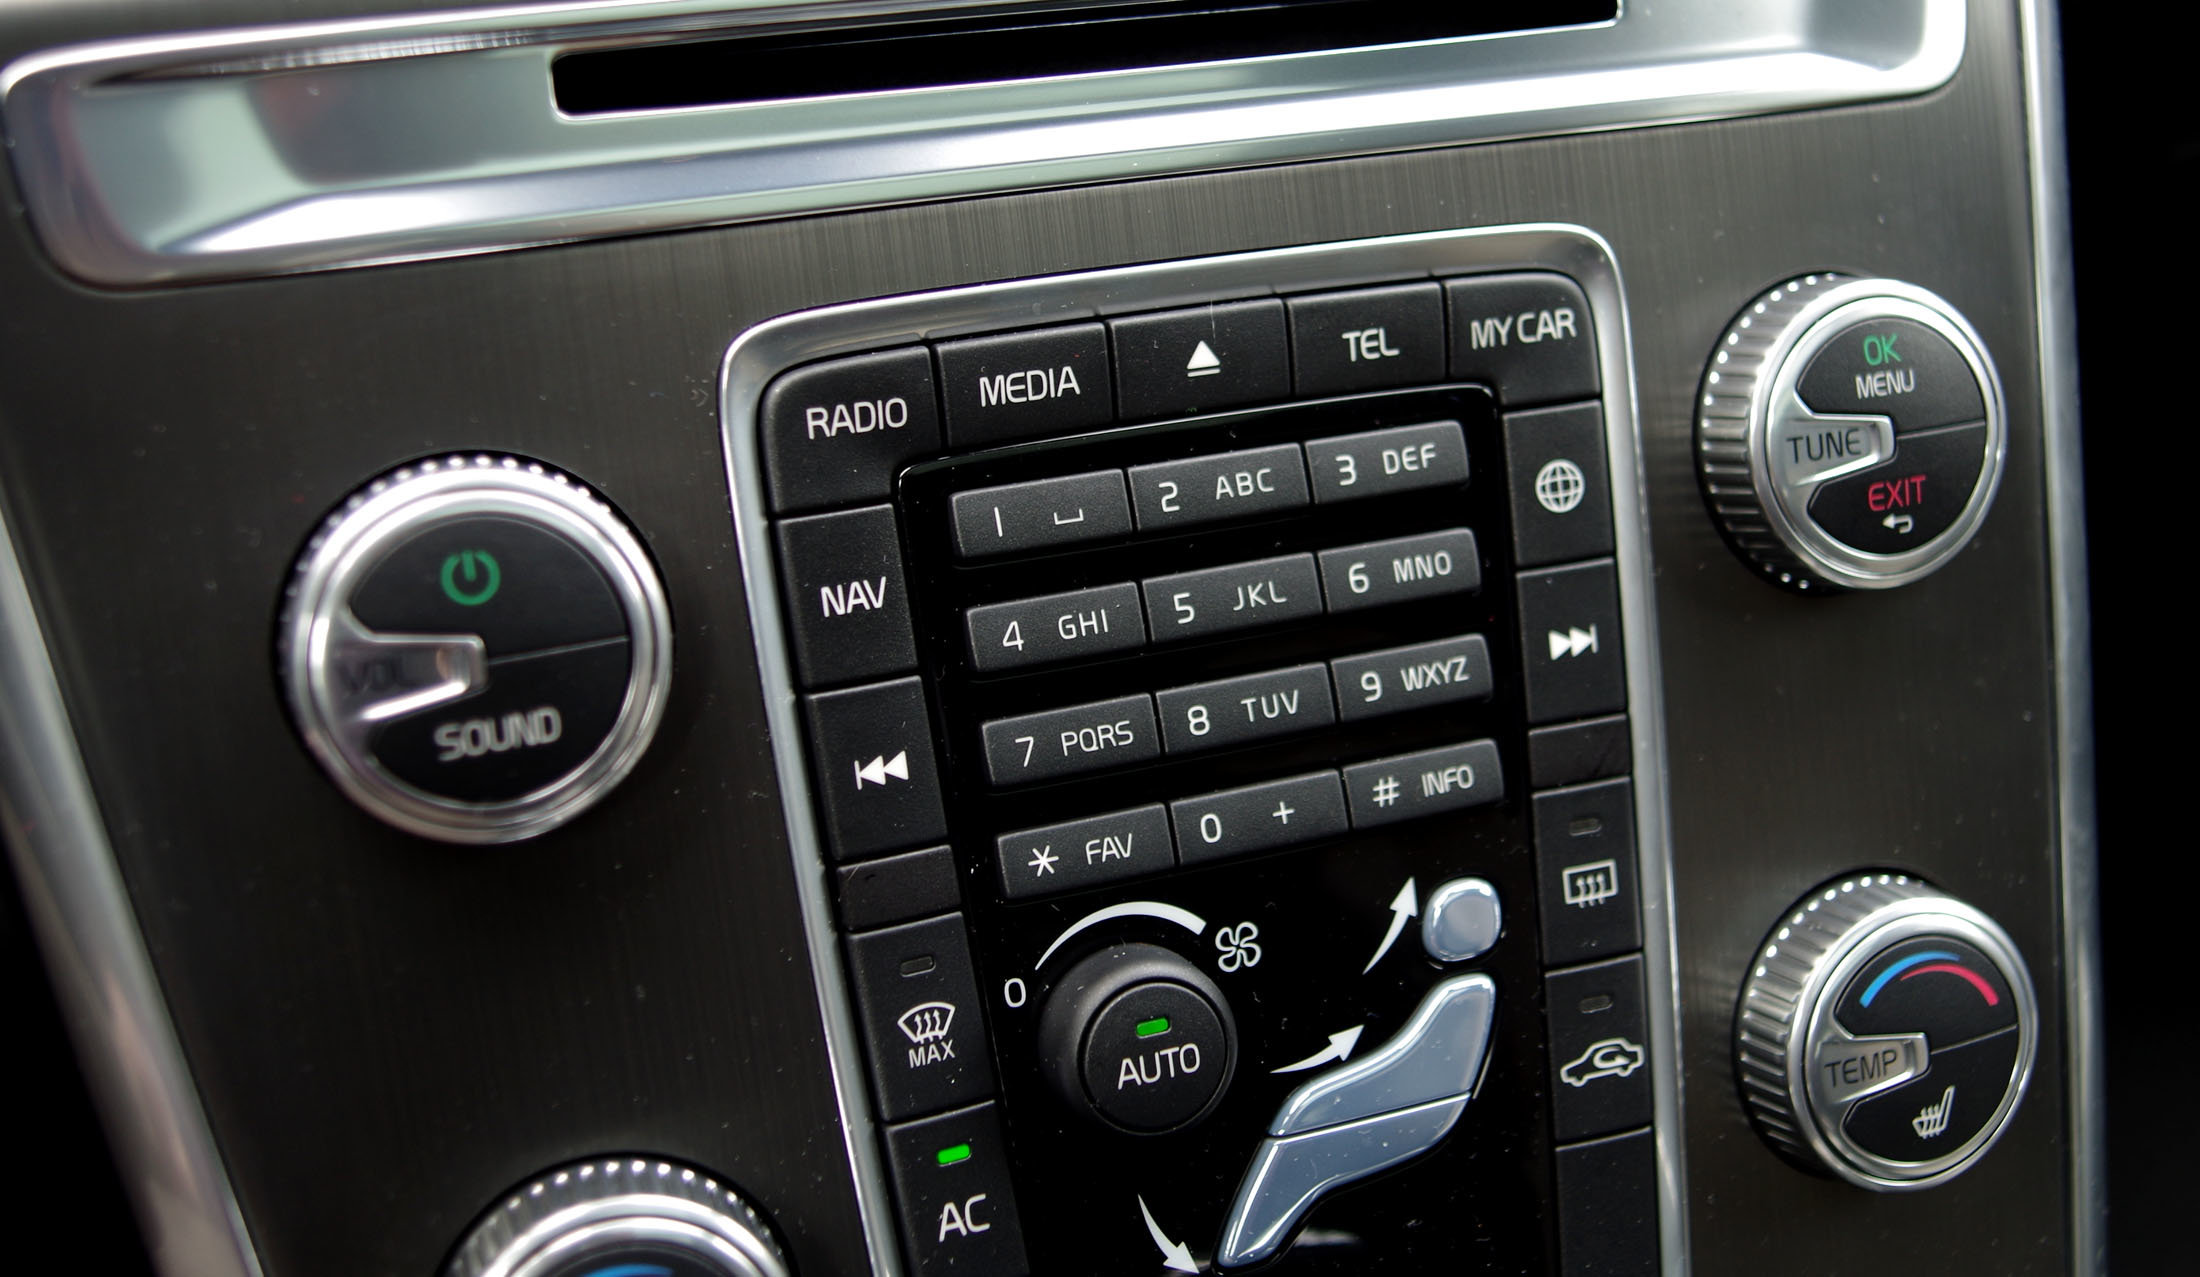 Volvo XC60 text entry